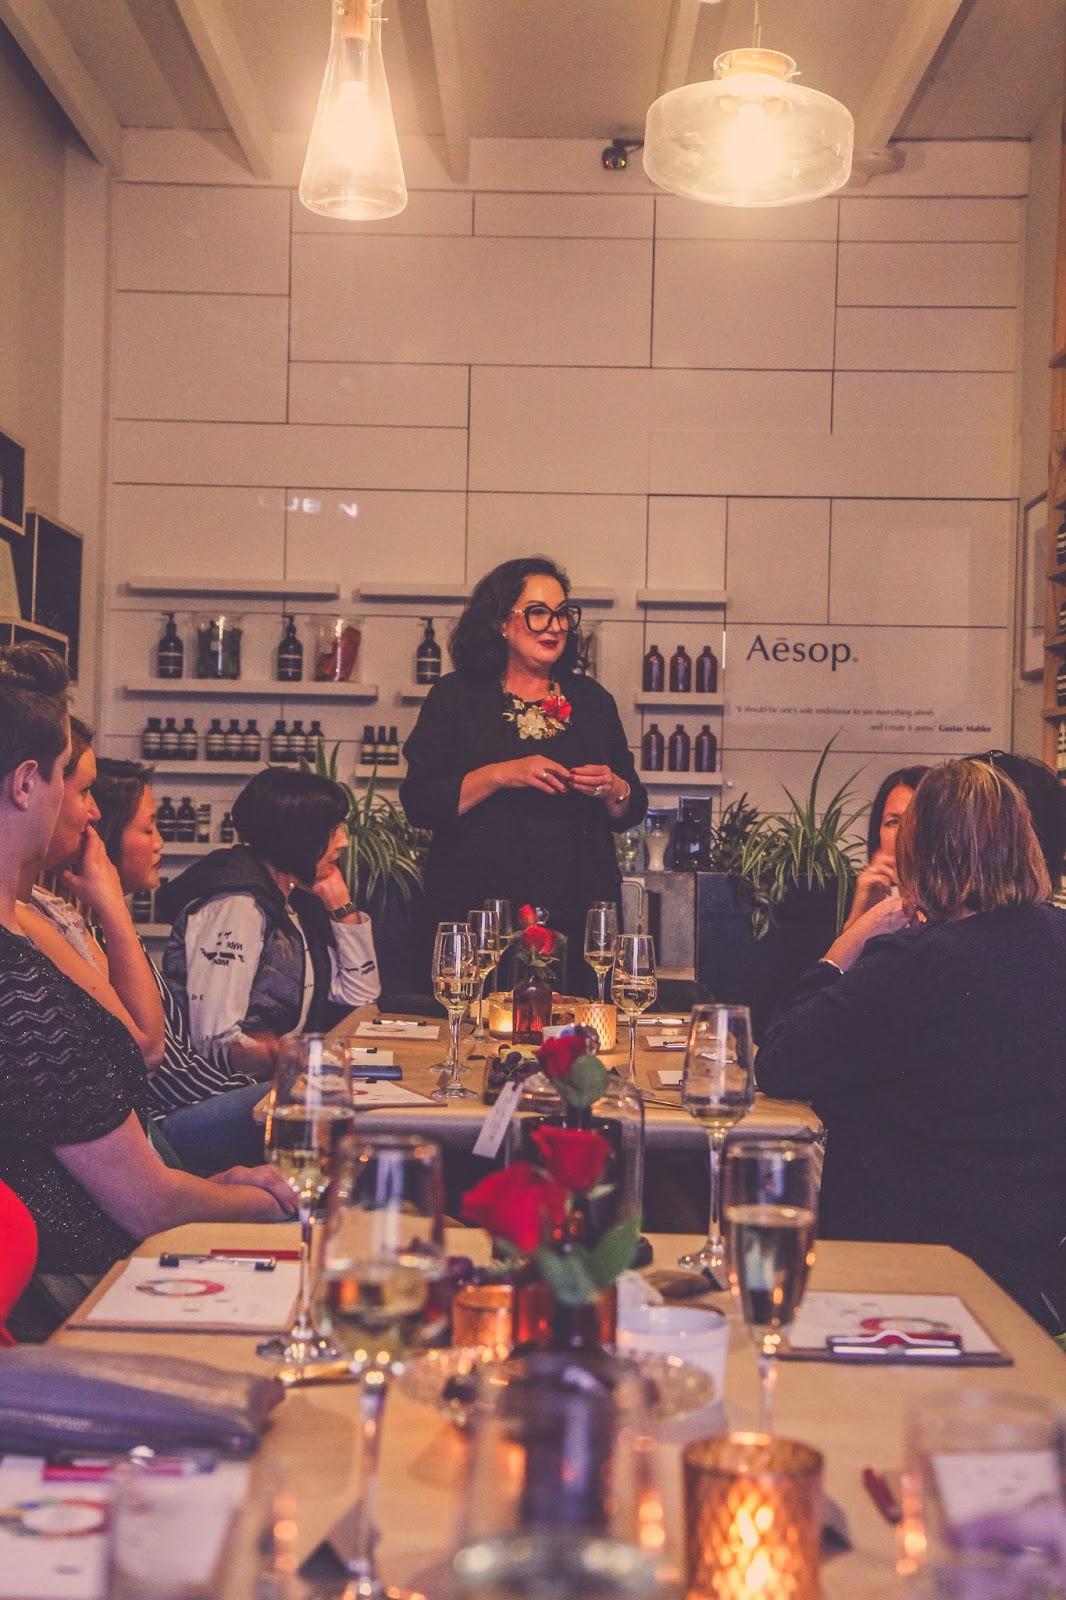 Liana of @findingfemme attends a perfume masterclass at Sweet Fern Ballarat